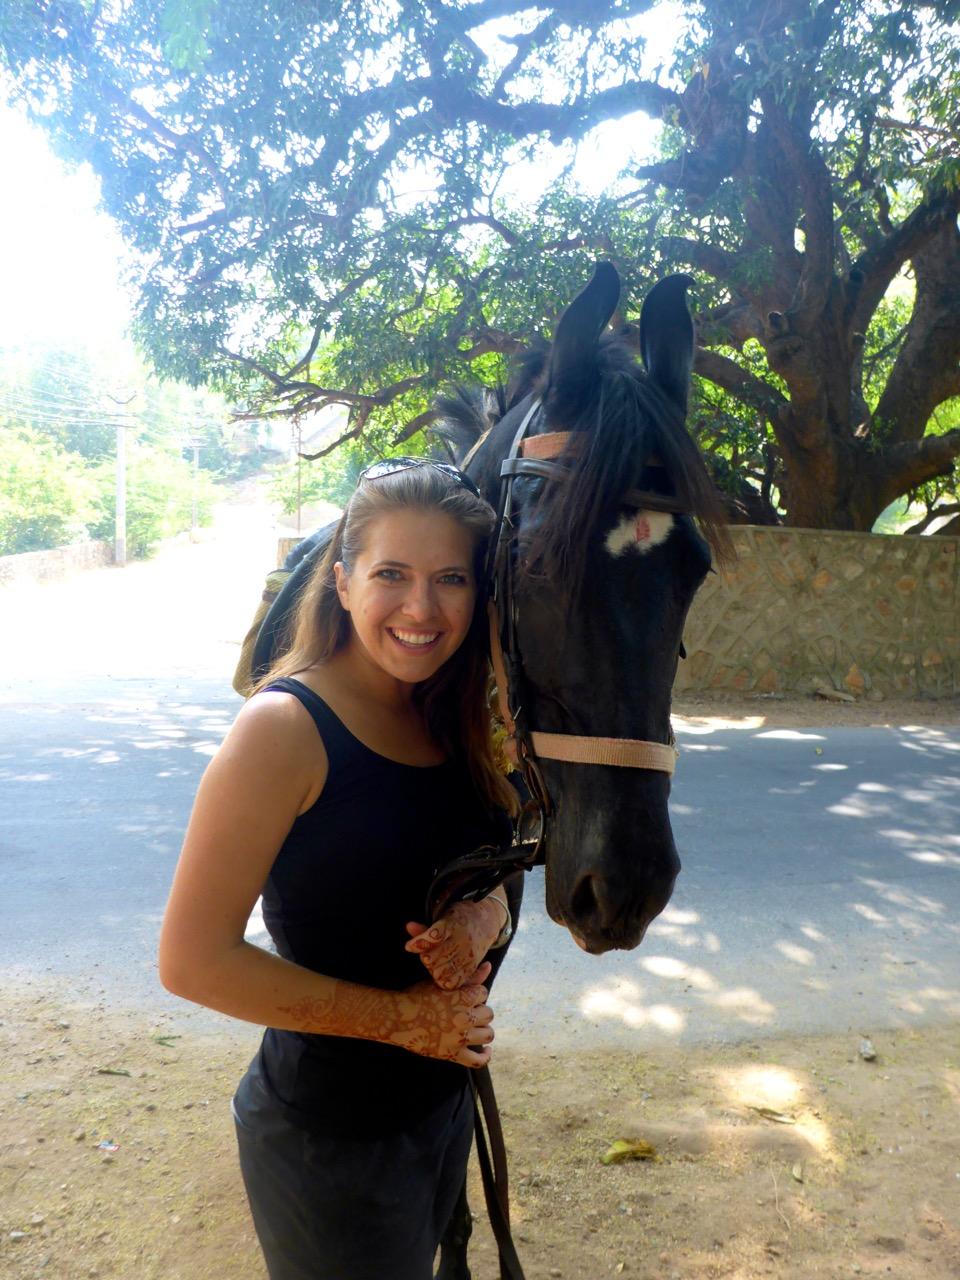 Riding Black Beauty - Marwari Horses of India